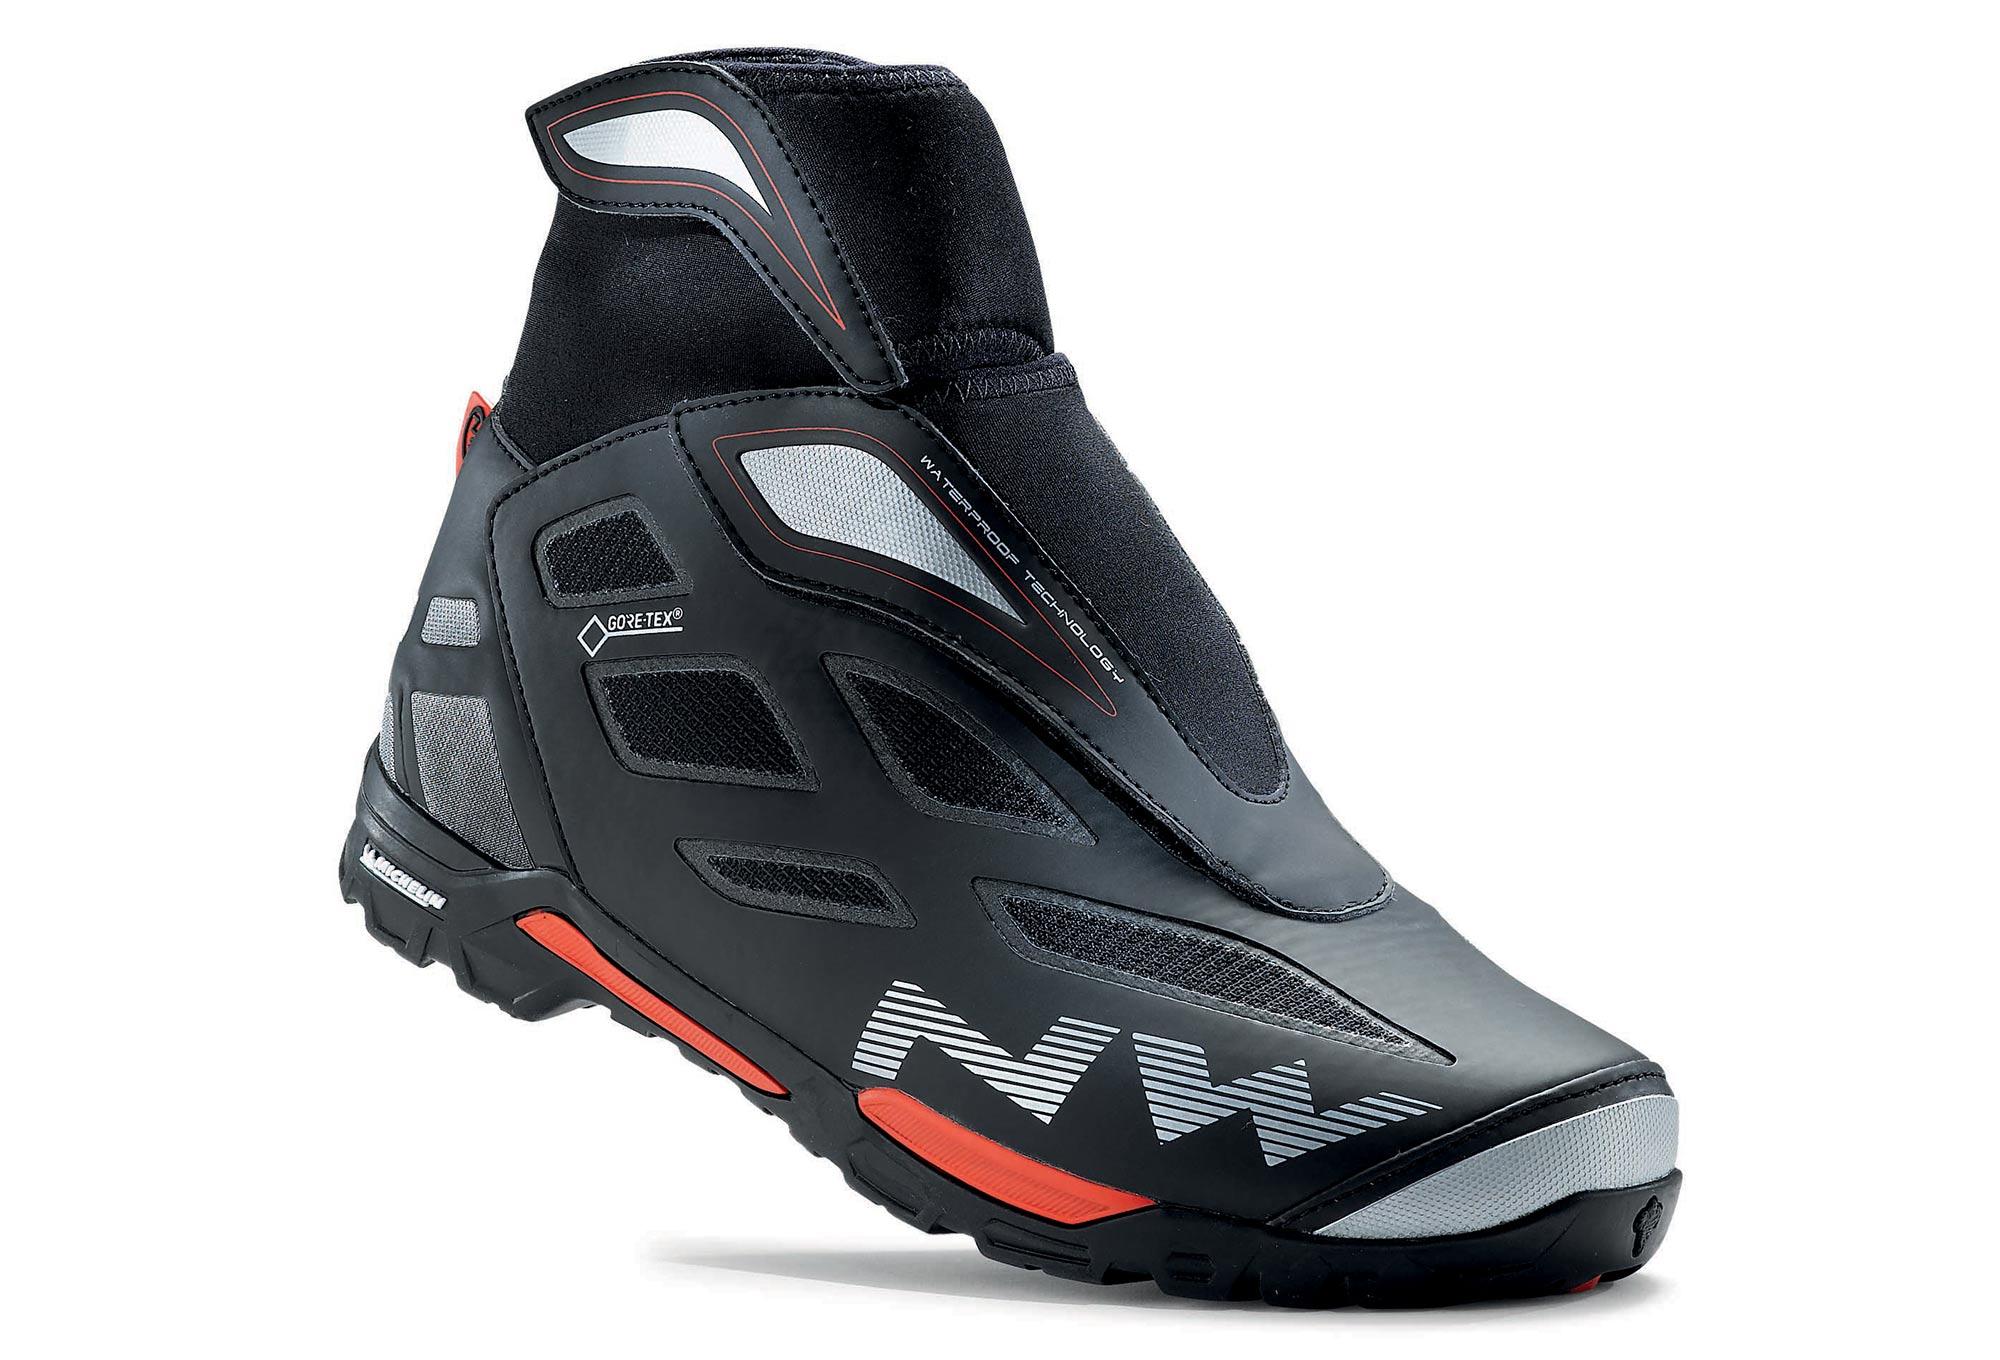 hot sales good looking high fashion Chaussures VTT Hiver Northwave X-Cross GTX Noir